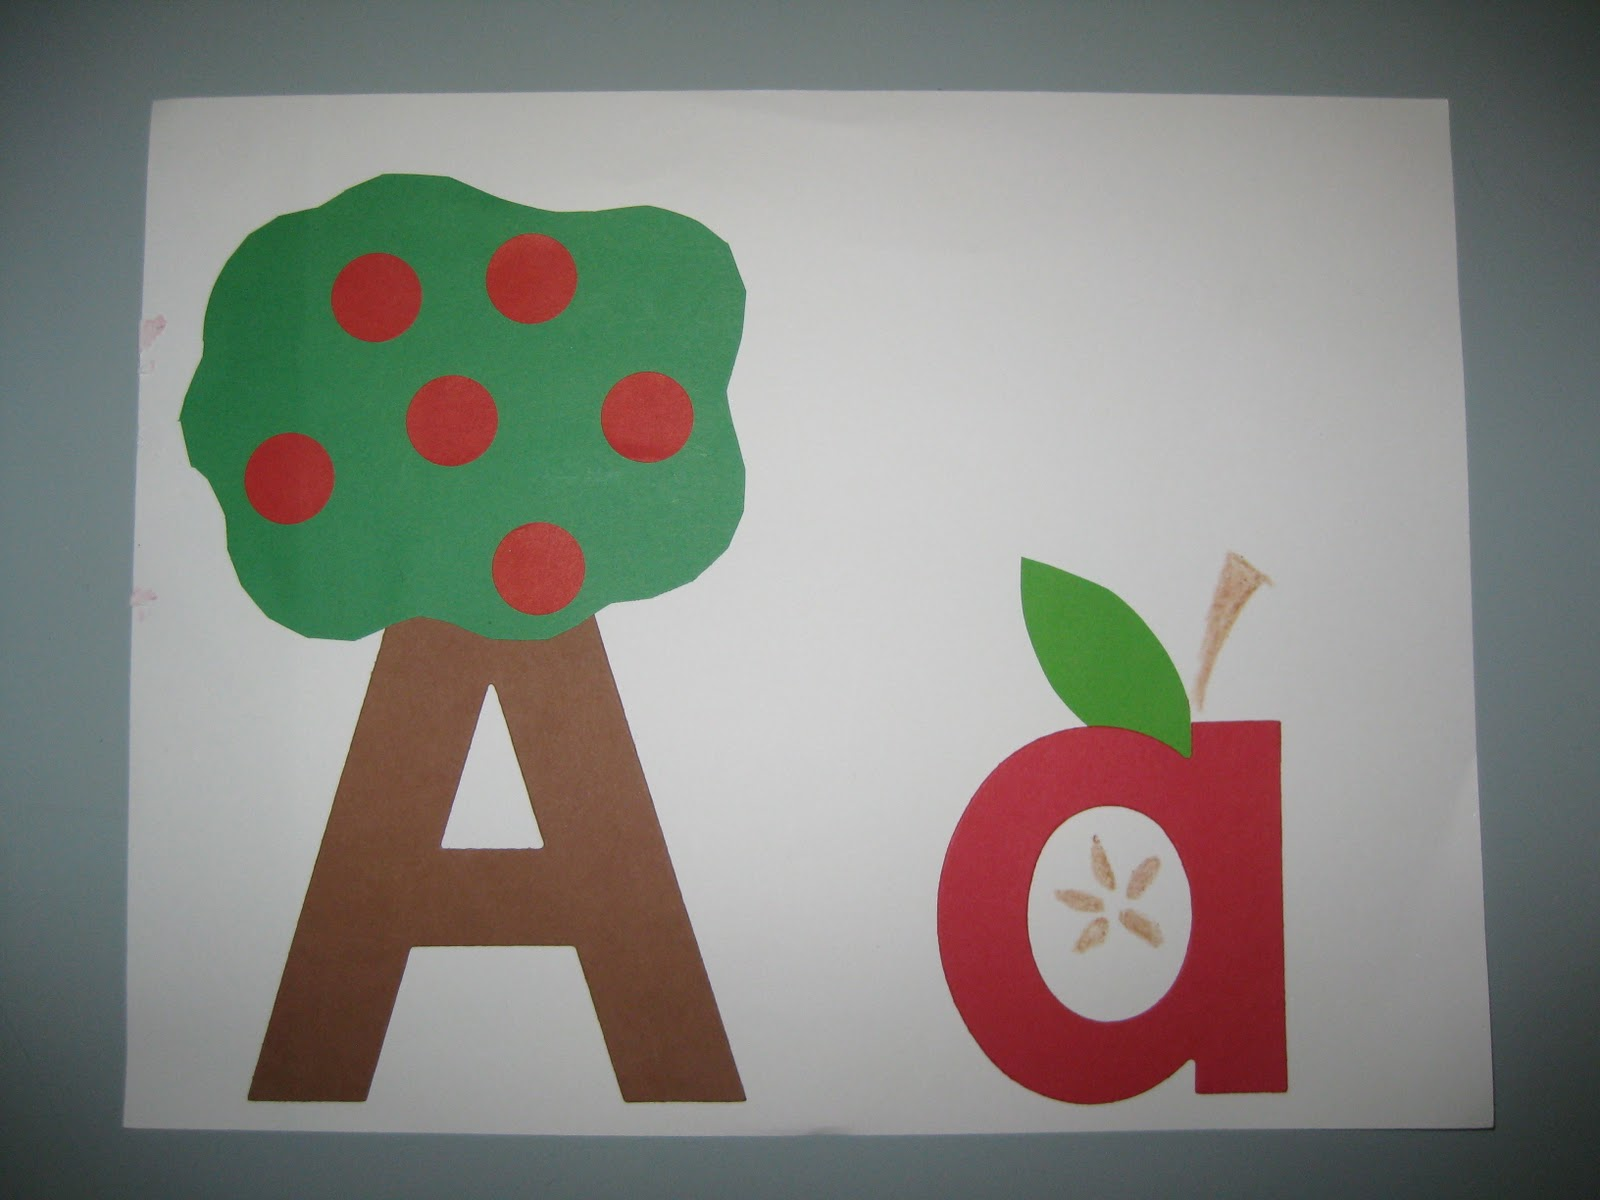 Apple-letter-a-craft-preschool